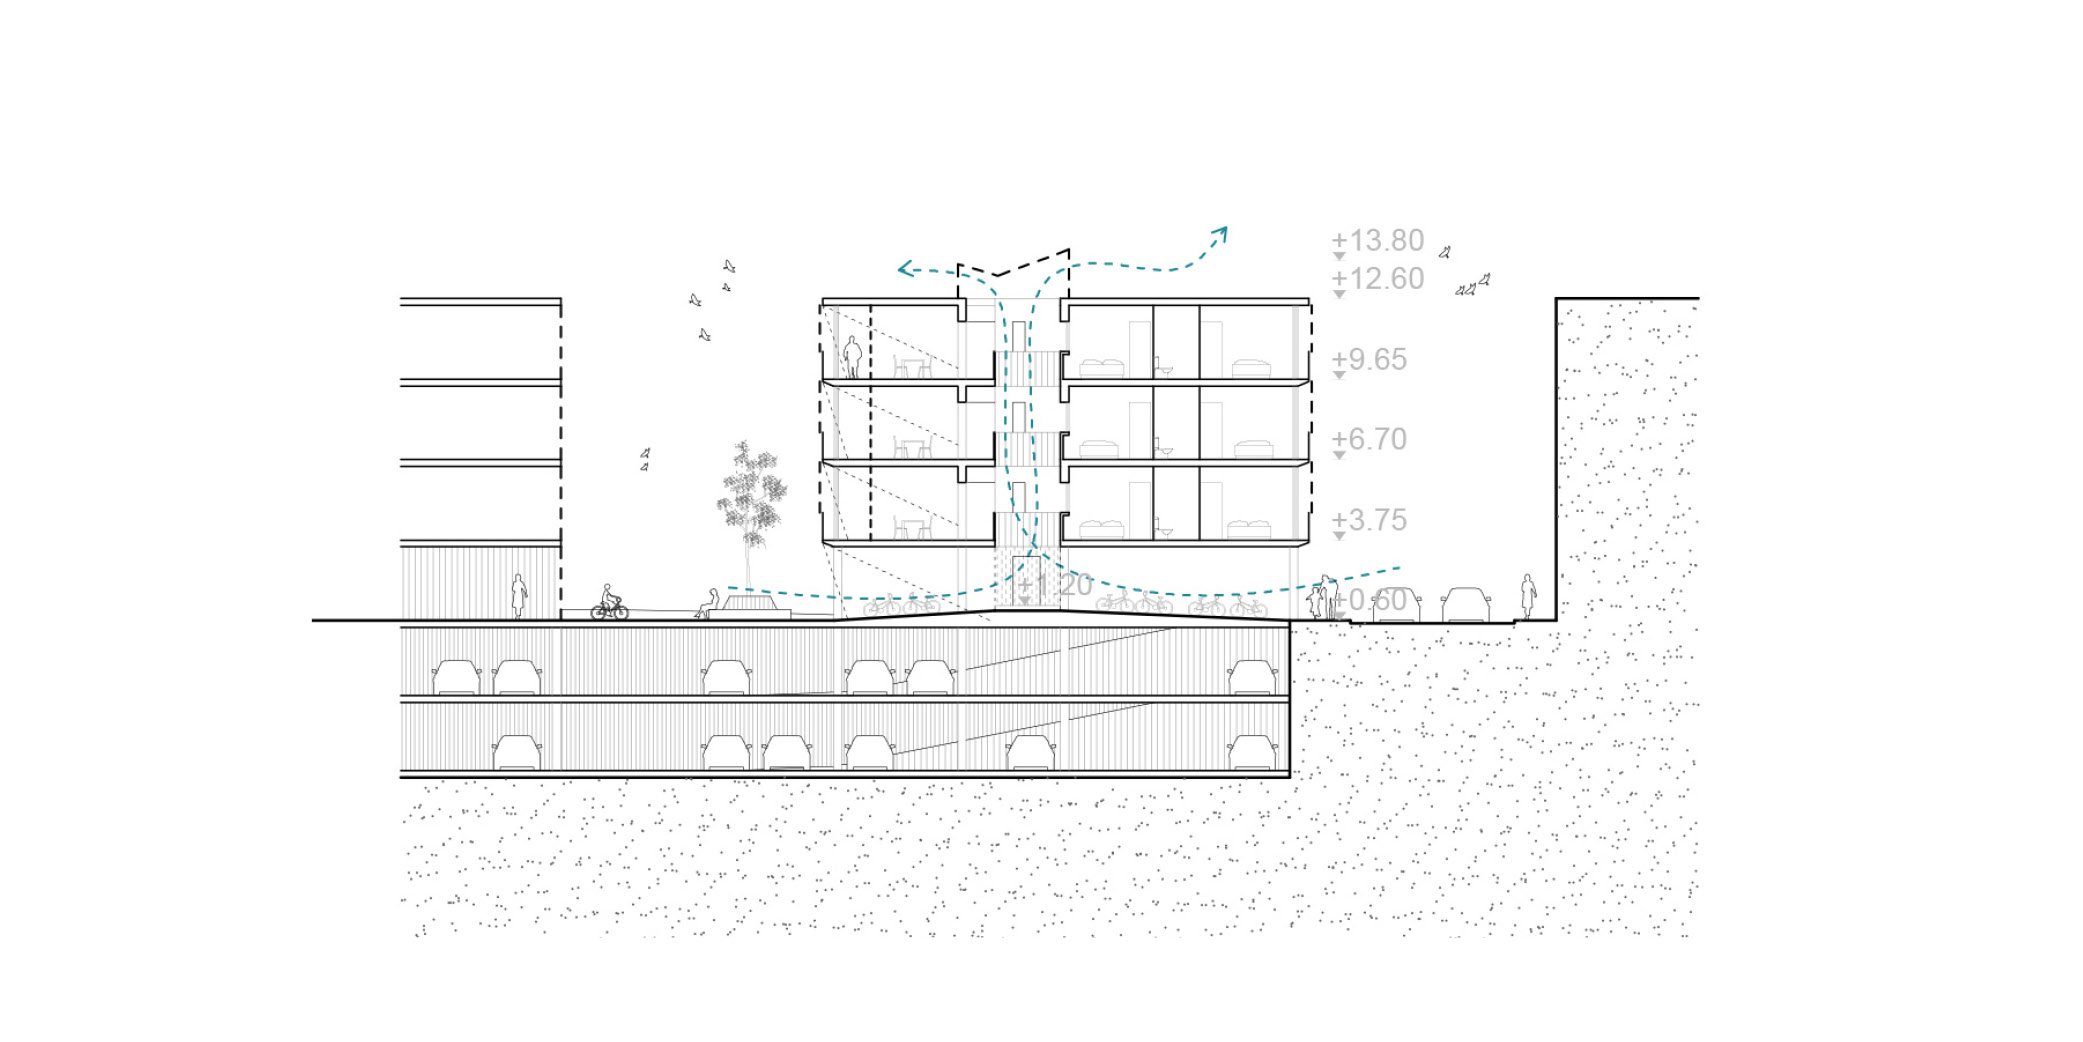 Terrasa housing OCA ARCHITEctS OCA ARQUITECTOS architecture design Hernan Lleida Bernardo Garcia 4